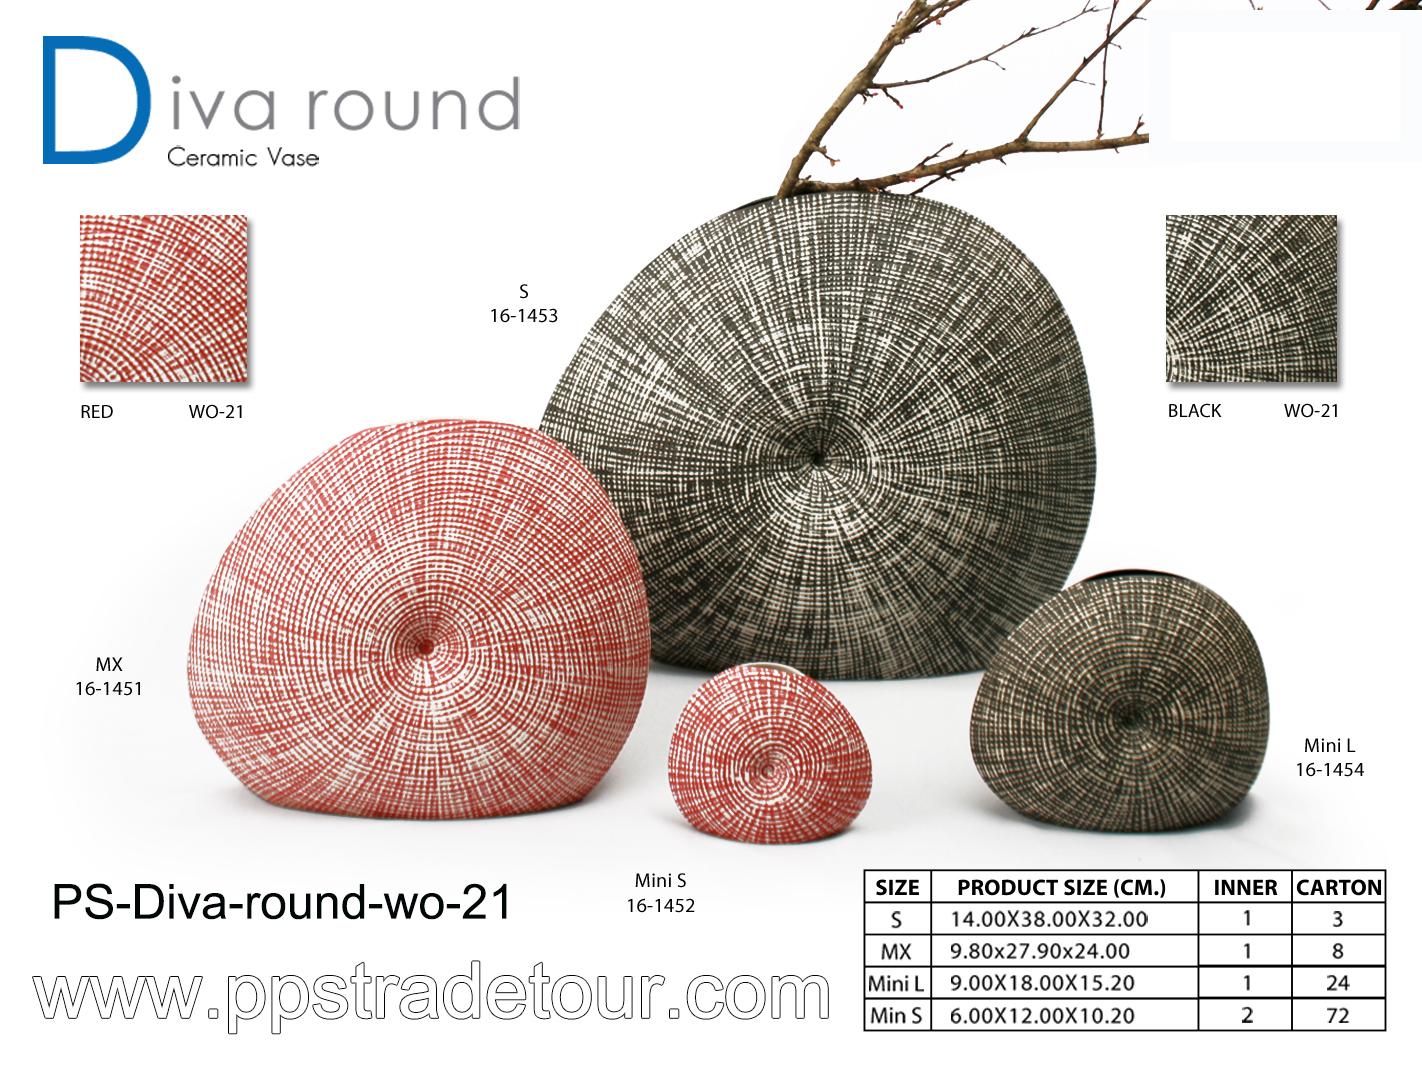 PSCV-Diva-round-wo-21